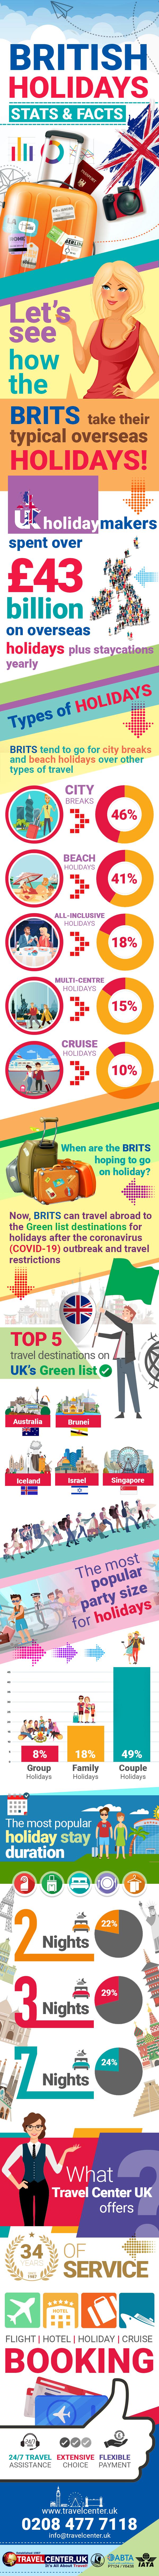 British Holidays Stats & Facts